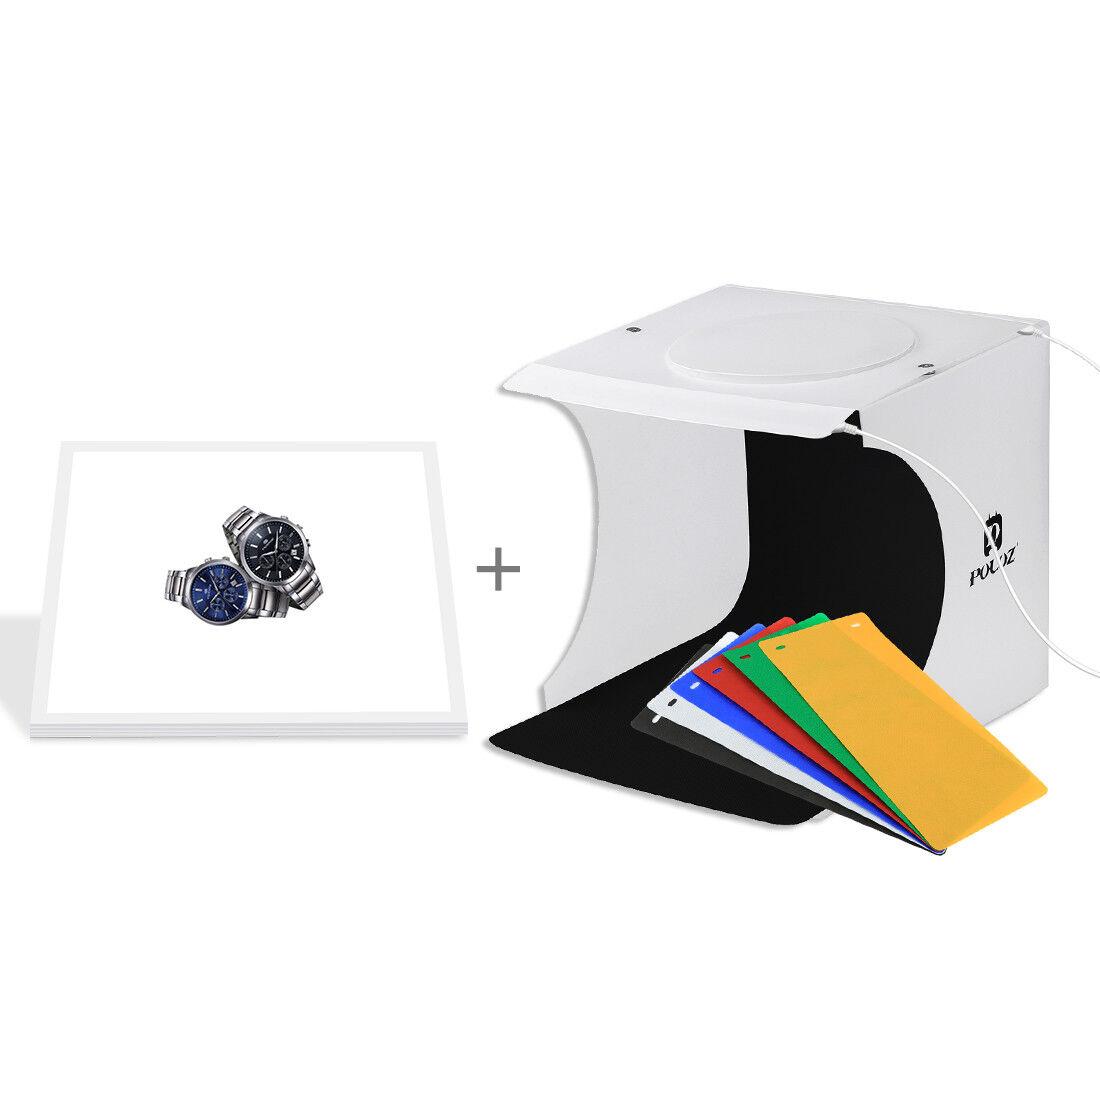 Mini LED Photography Shadowless Light Lamp Panel Pad 20cm x 20cm Effective Area Studio Shooting Tent Box Hasde Portable Mini Photo Studio Kit Acrylic Material